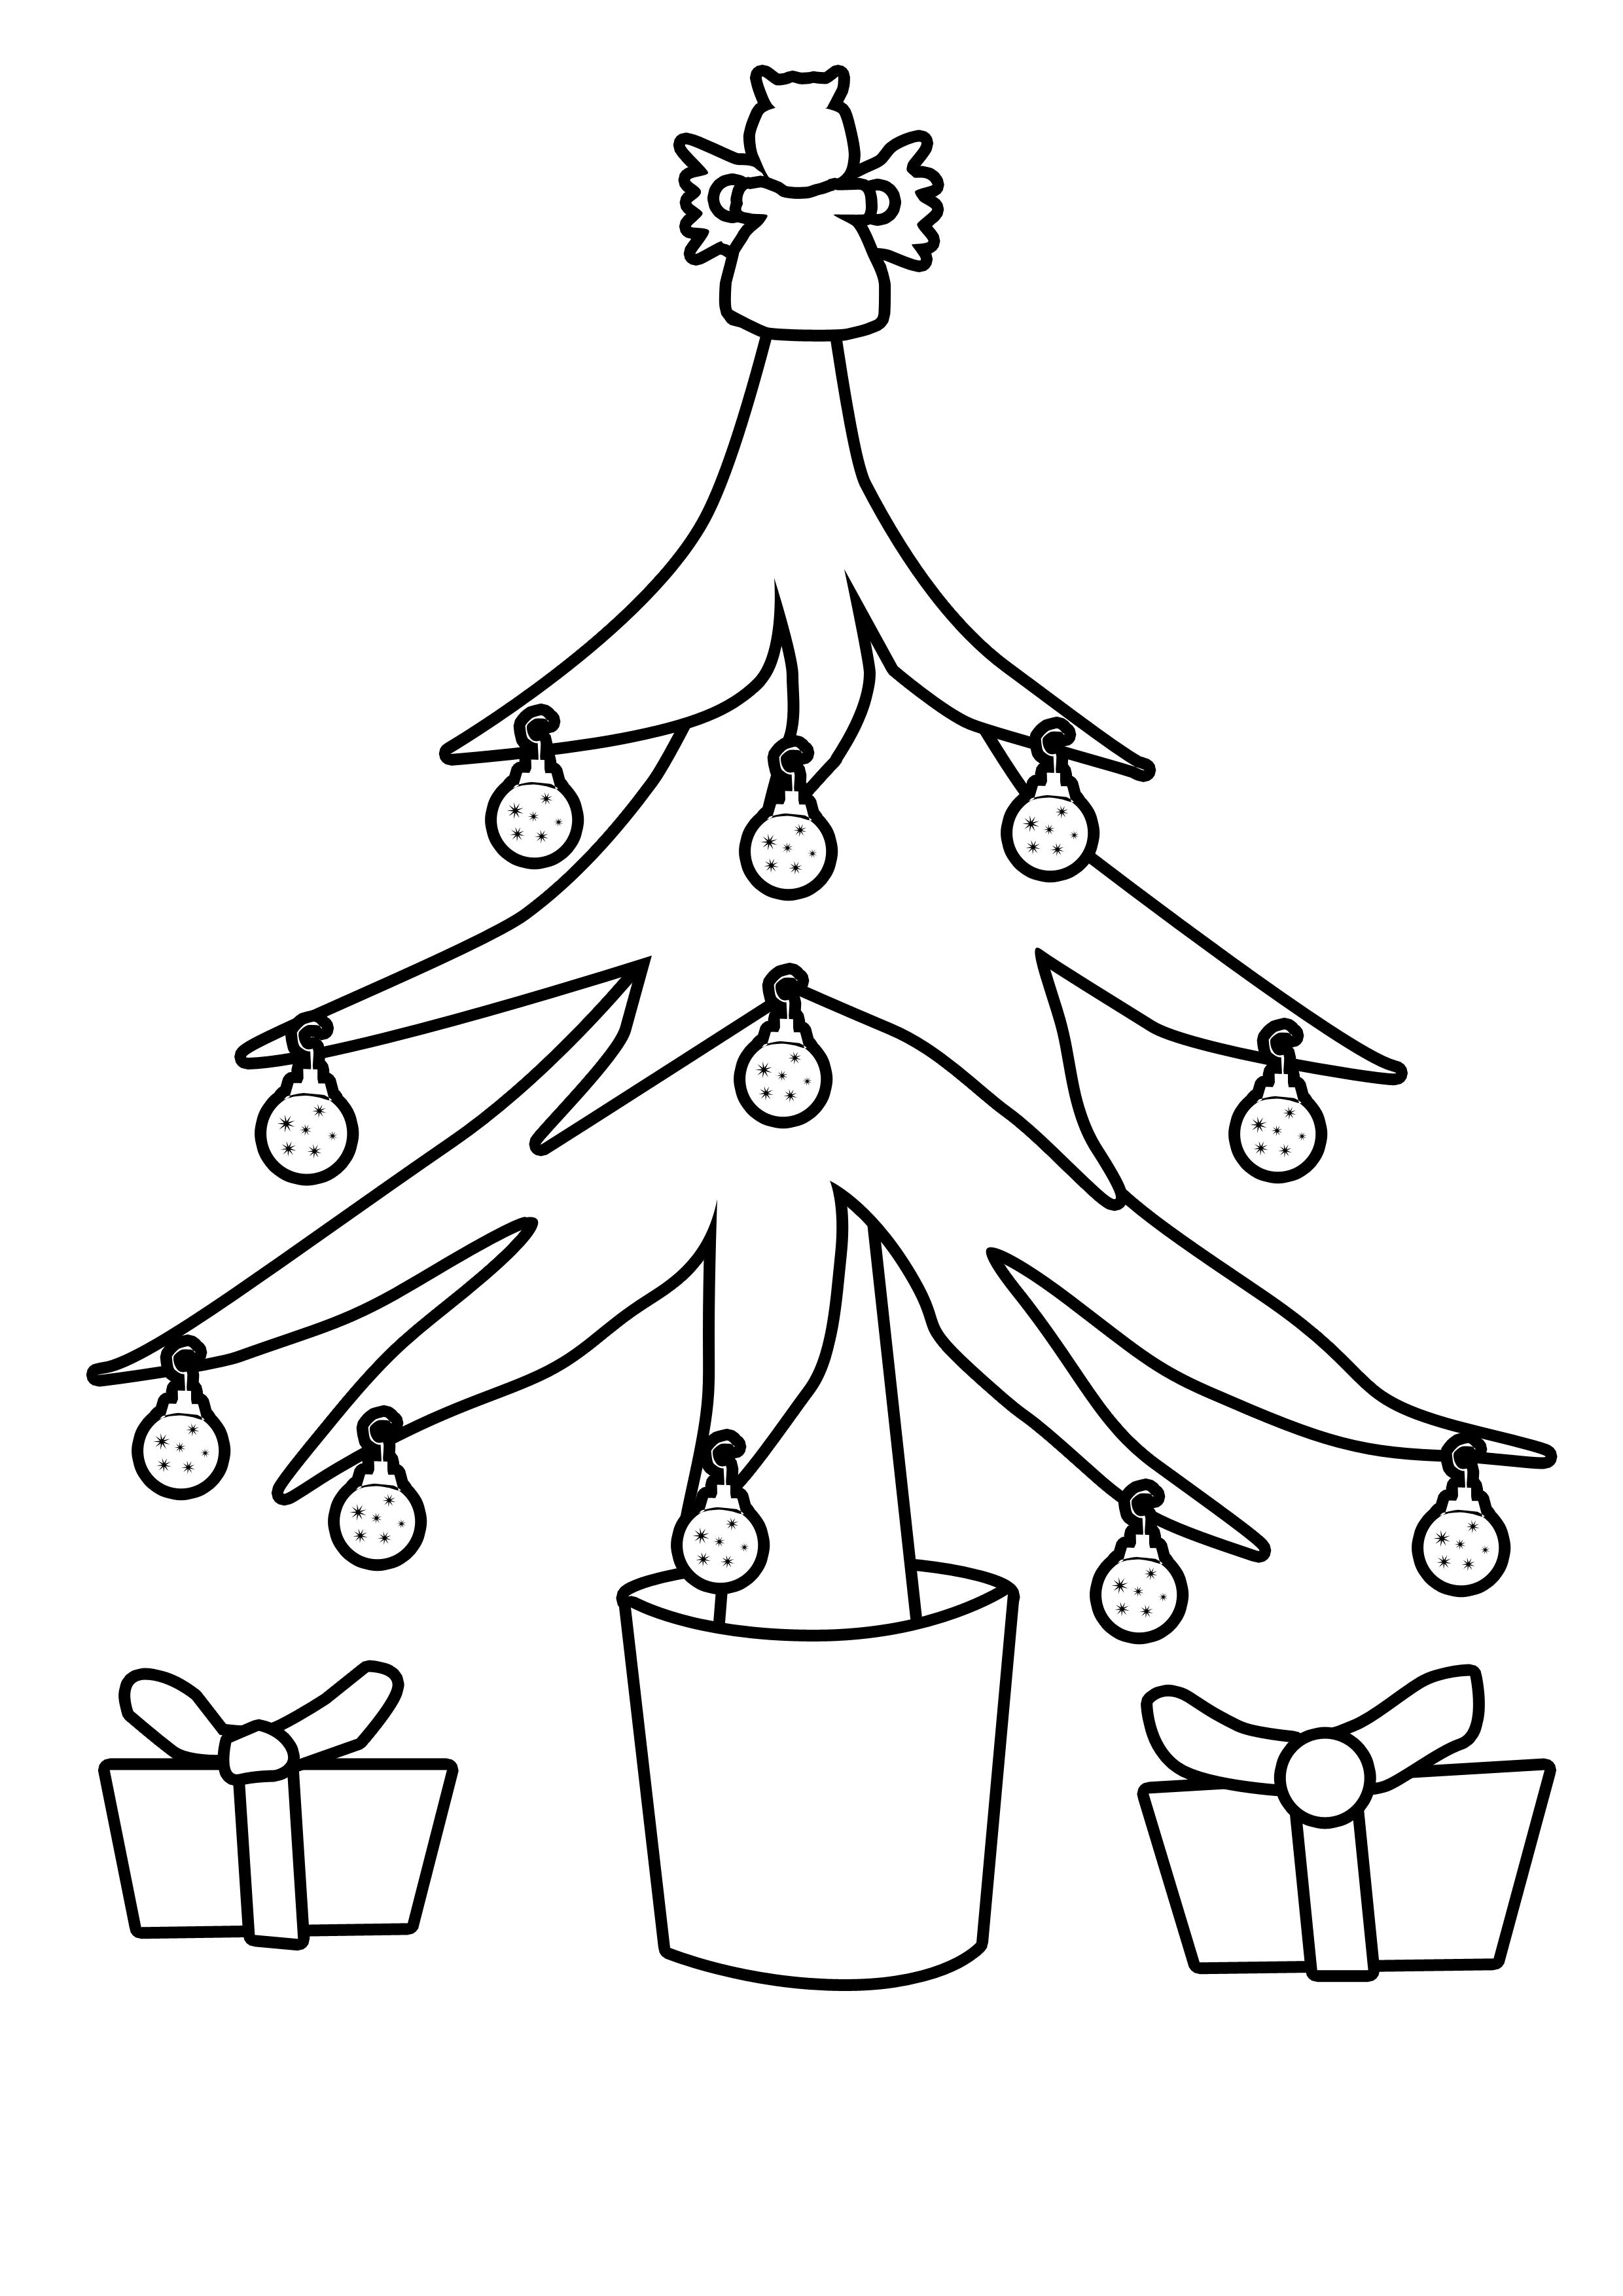 Falling Stars clipart xmas Clipart tree Outline Tree Tree